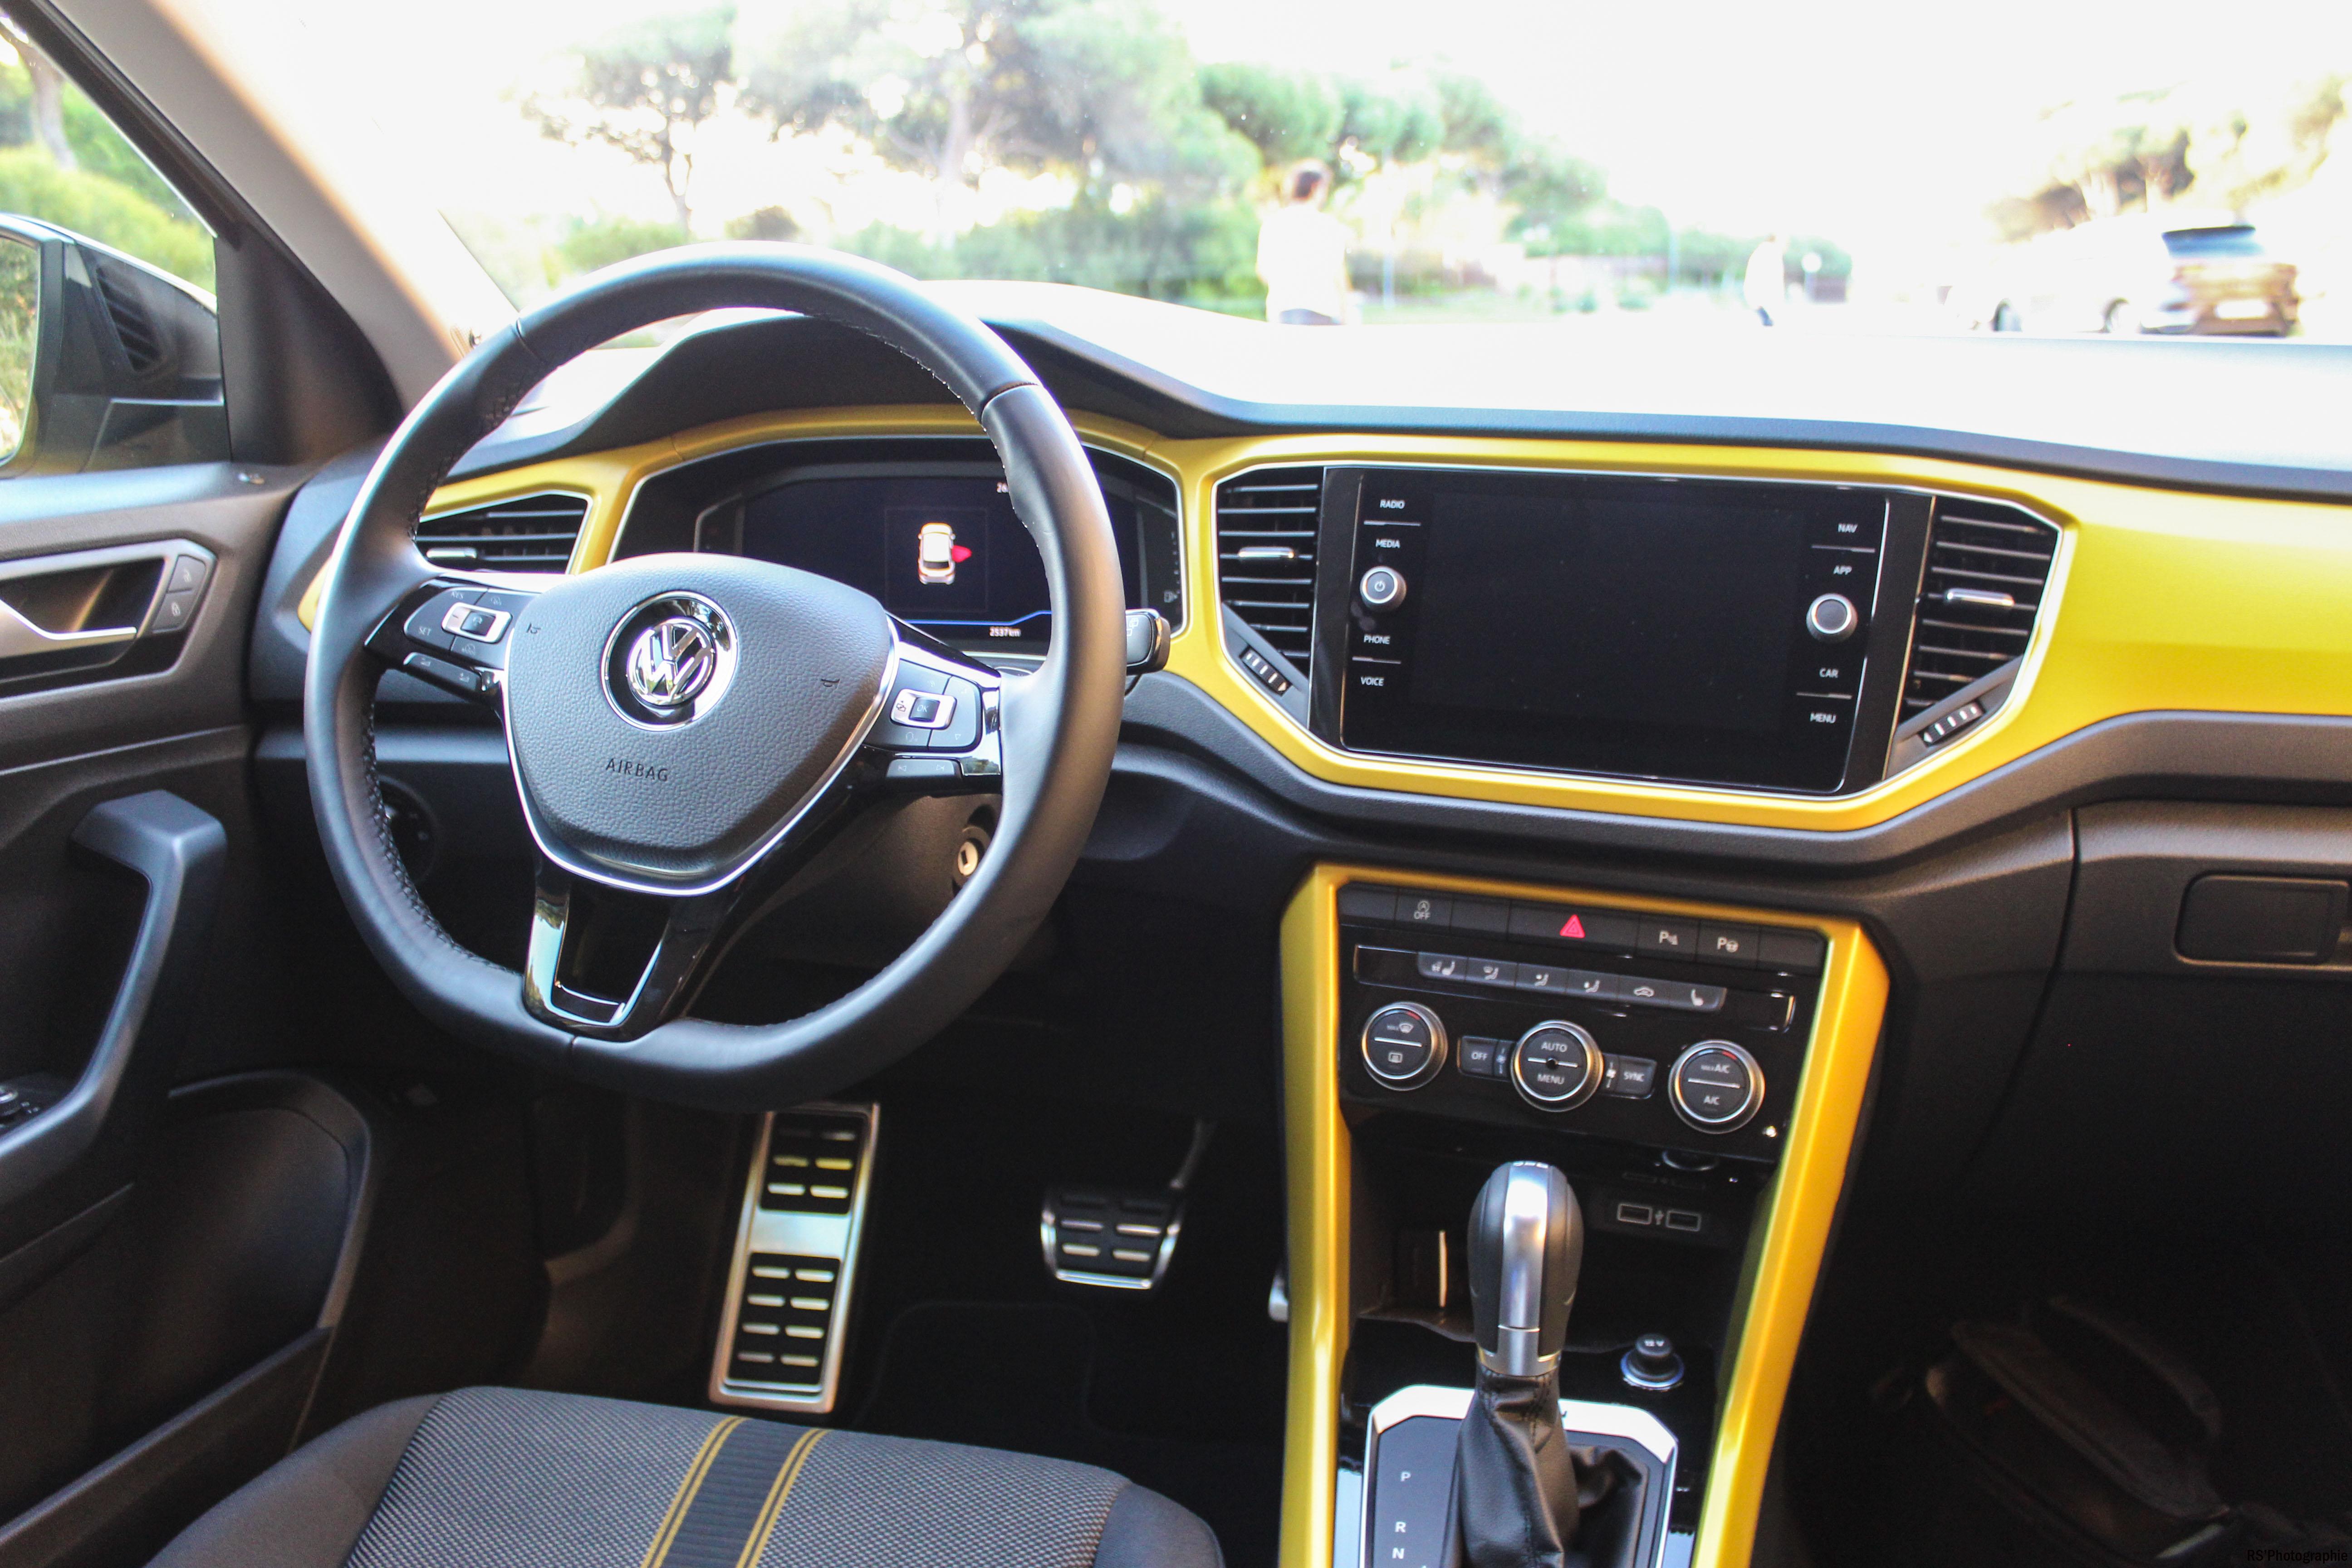 Volkswagentroc70-vw-t-roc-intérieur-onboard-Arnaud Demasier-RSPhotographie